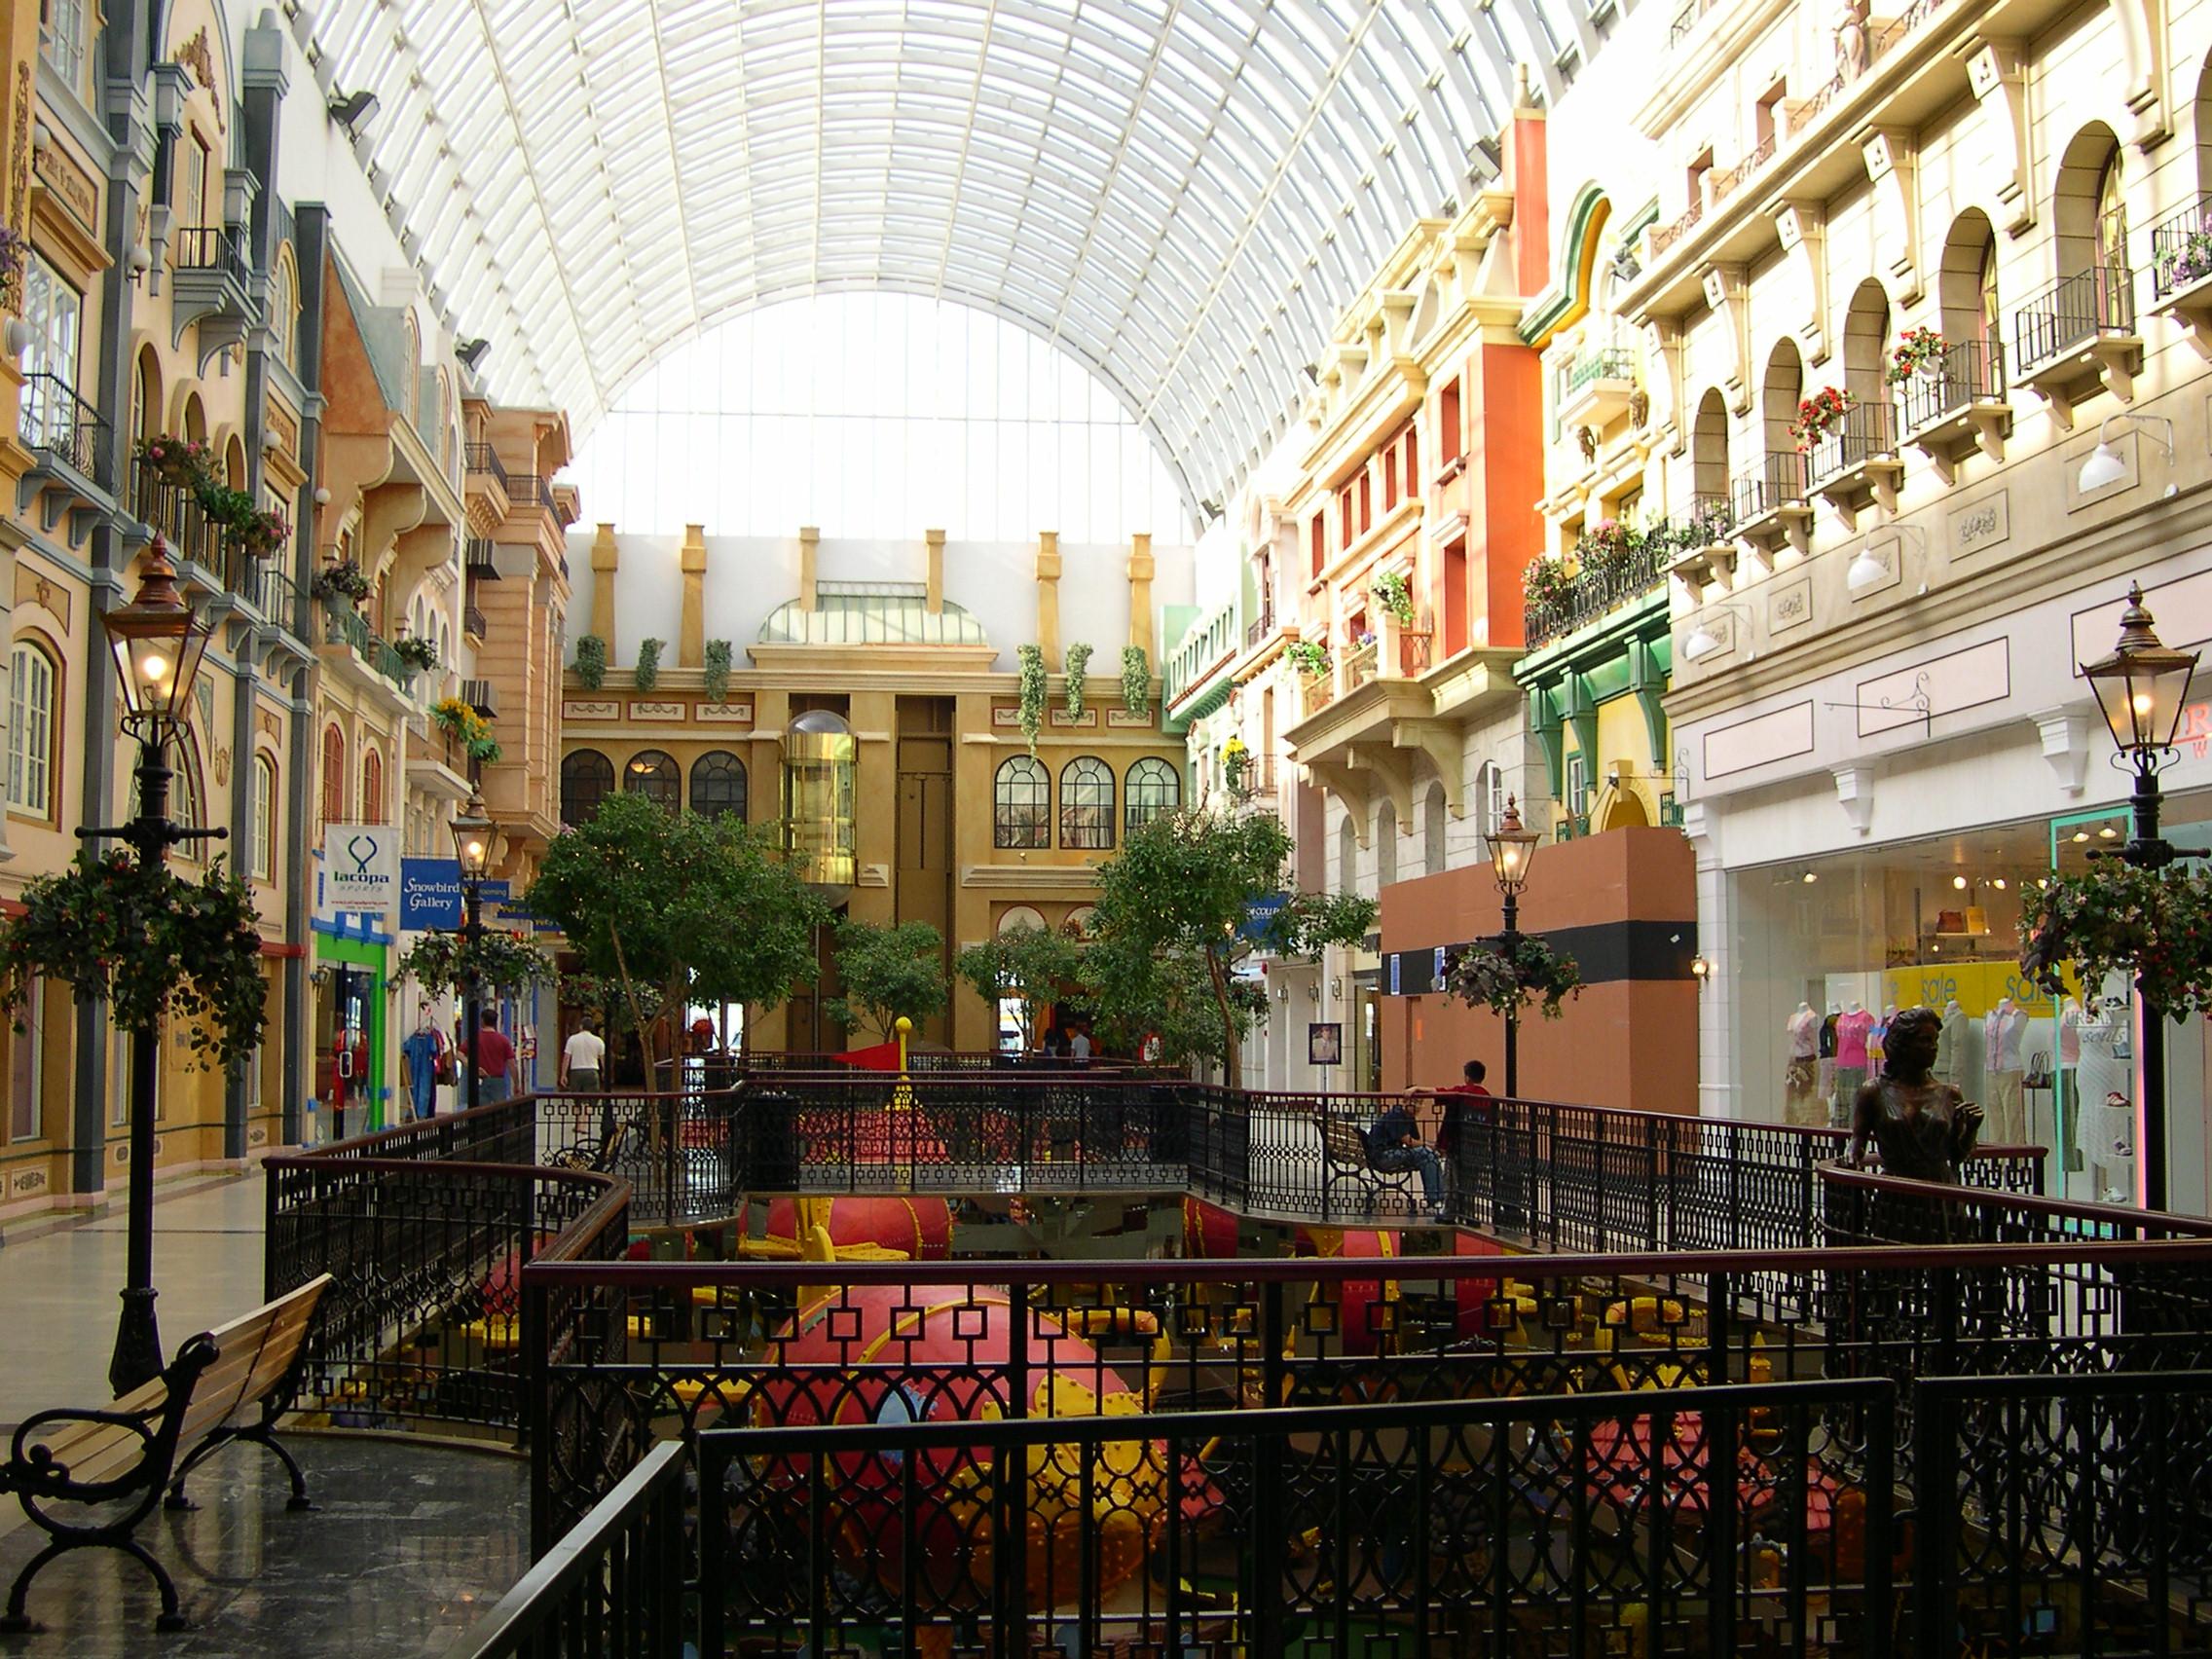 File:Shops in WEM jpg - Wikimedia Commons